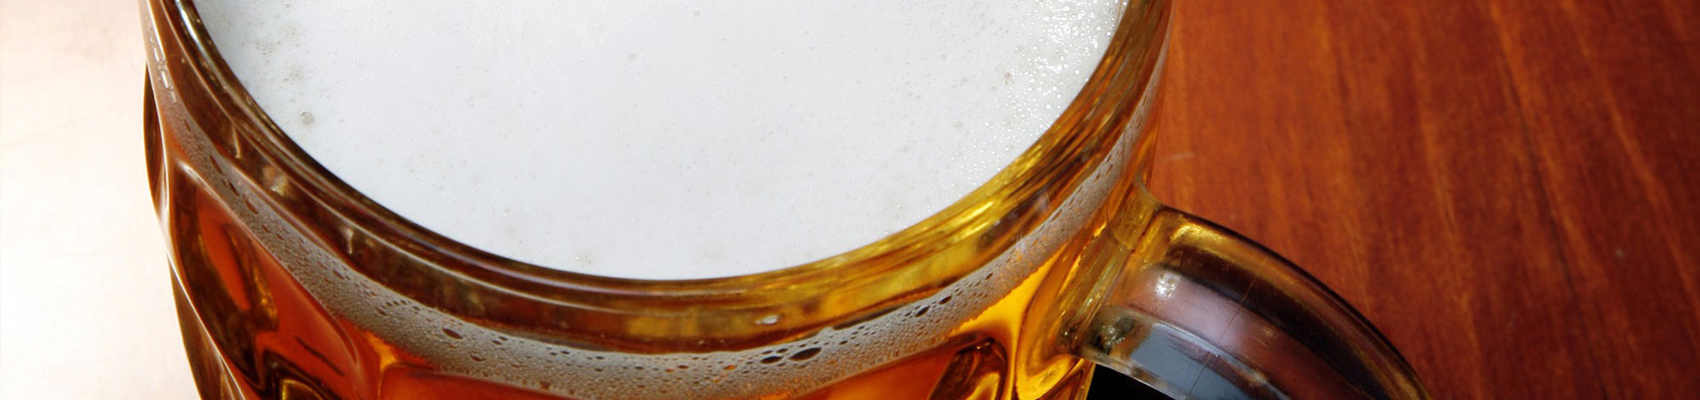 lyndoch-hotel-beer-banner